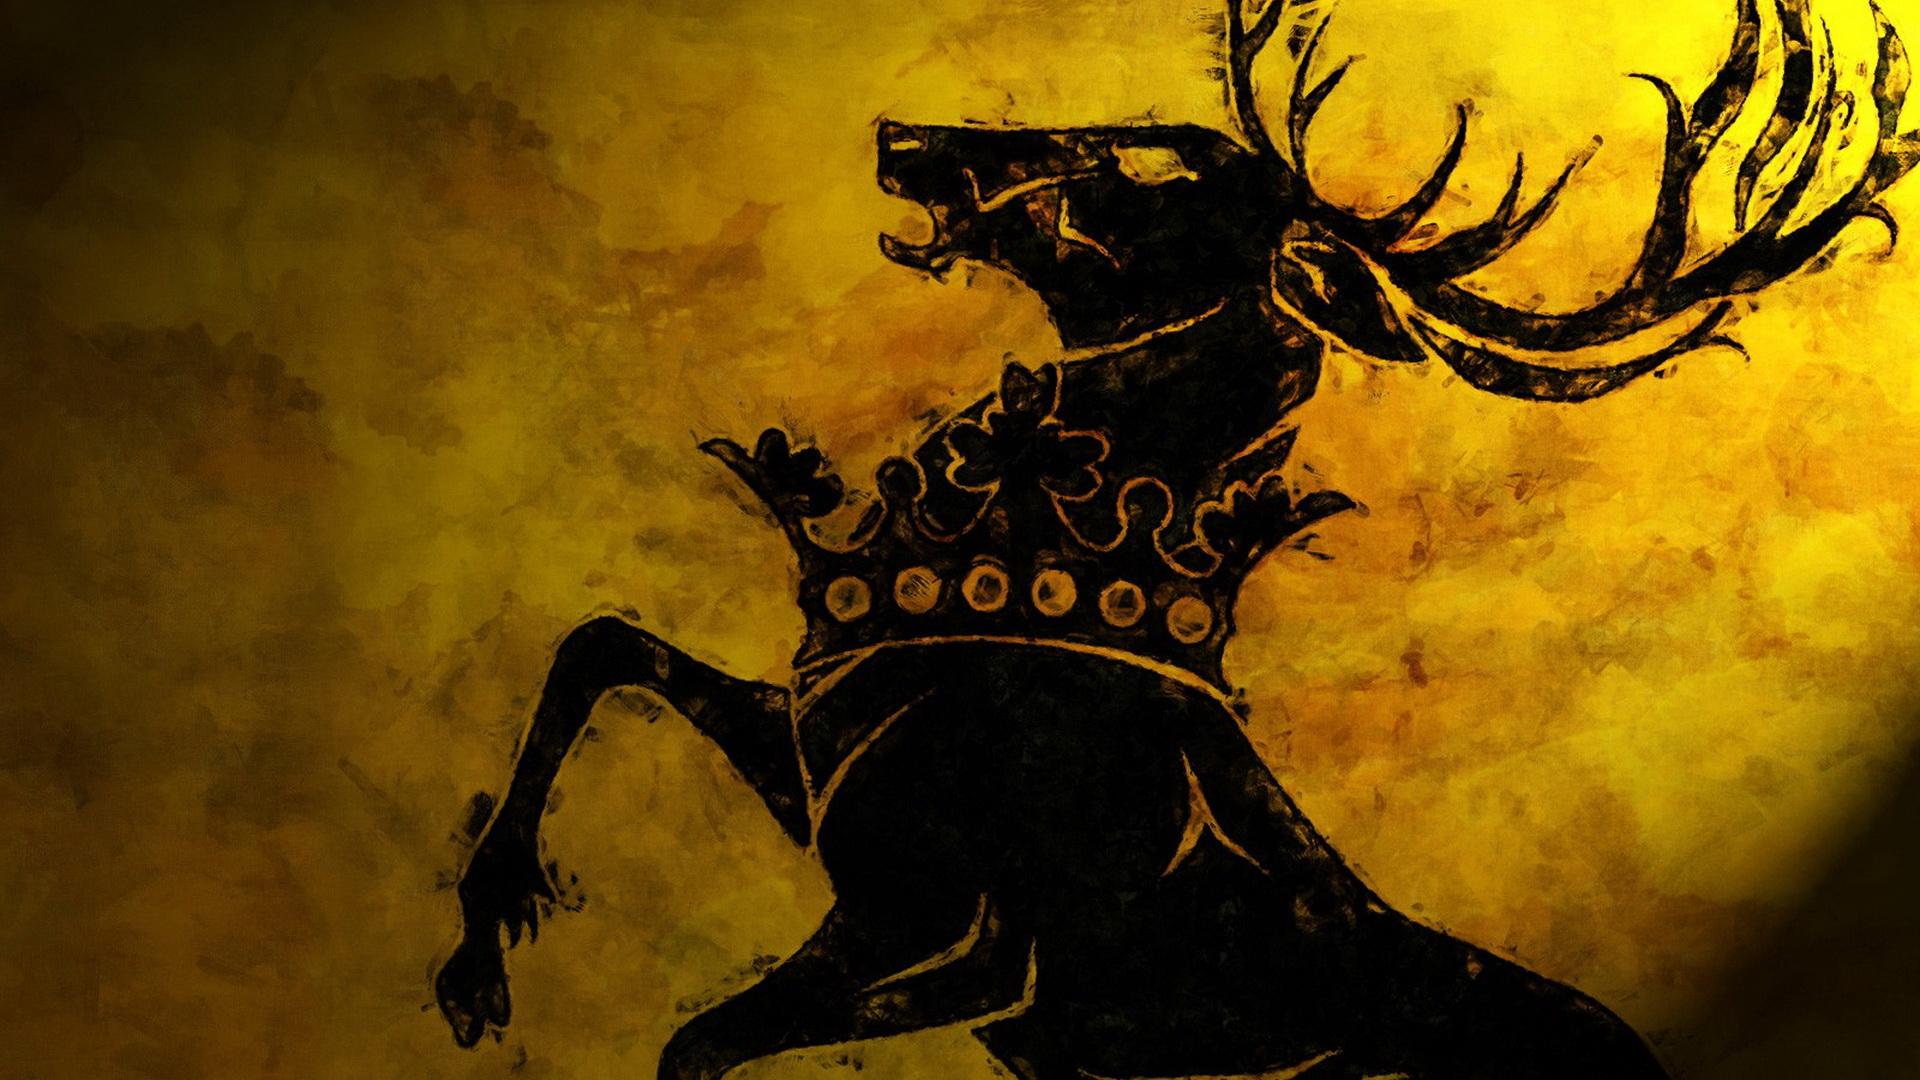 game of thrones season 5 desktop wallpapers